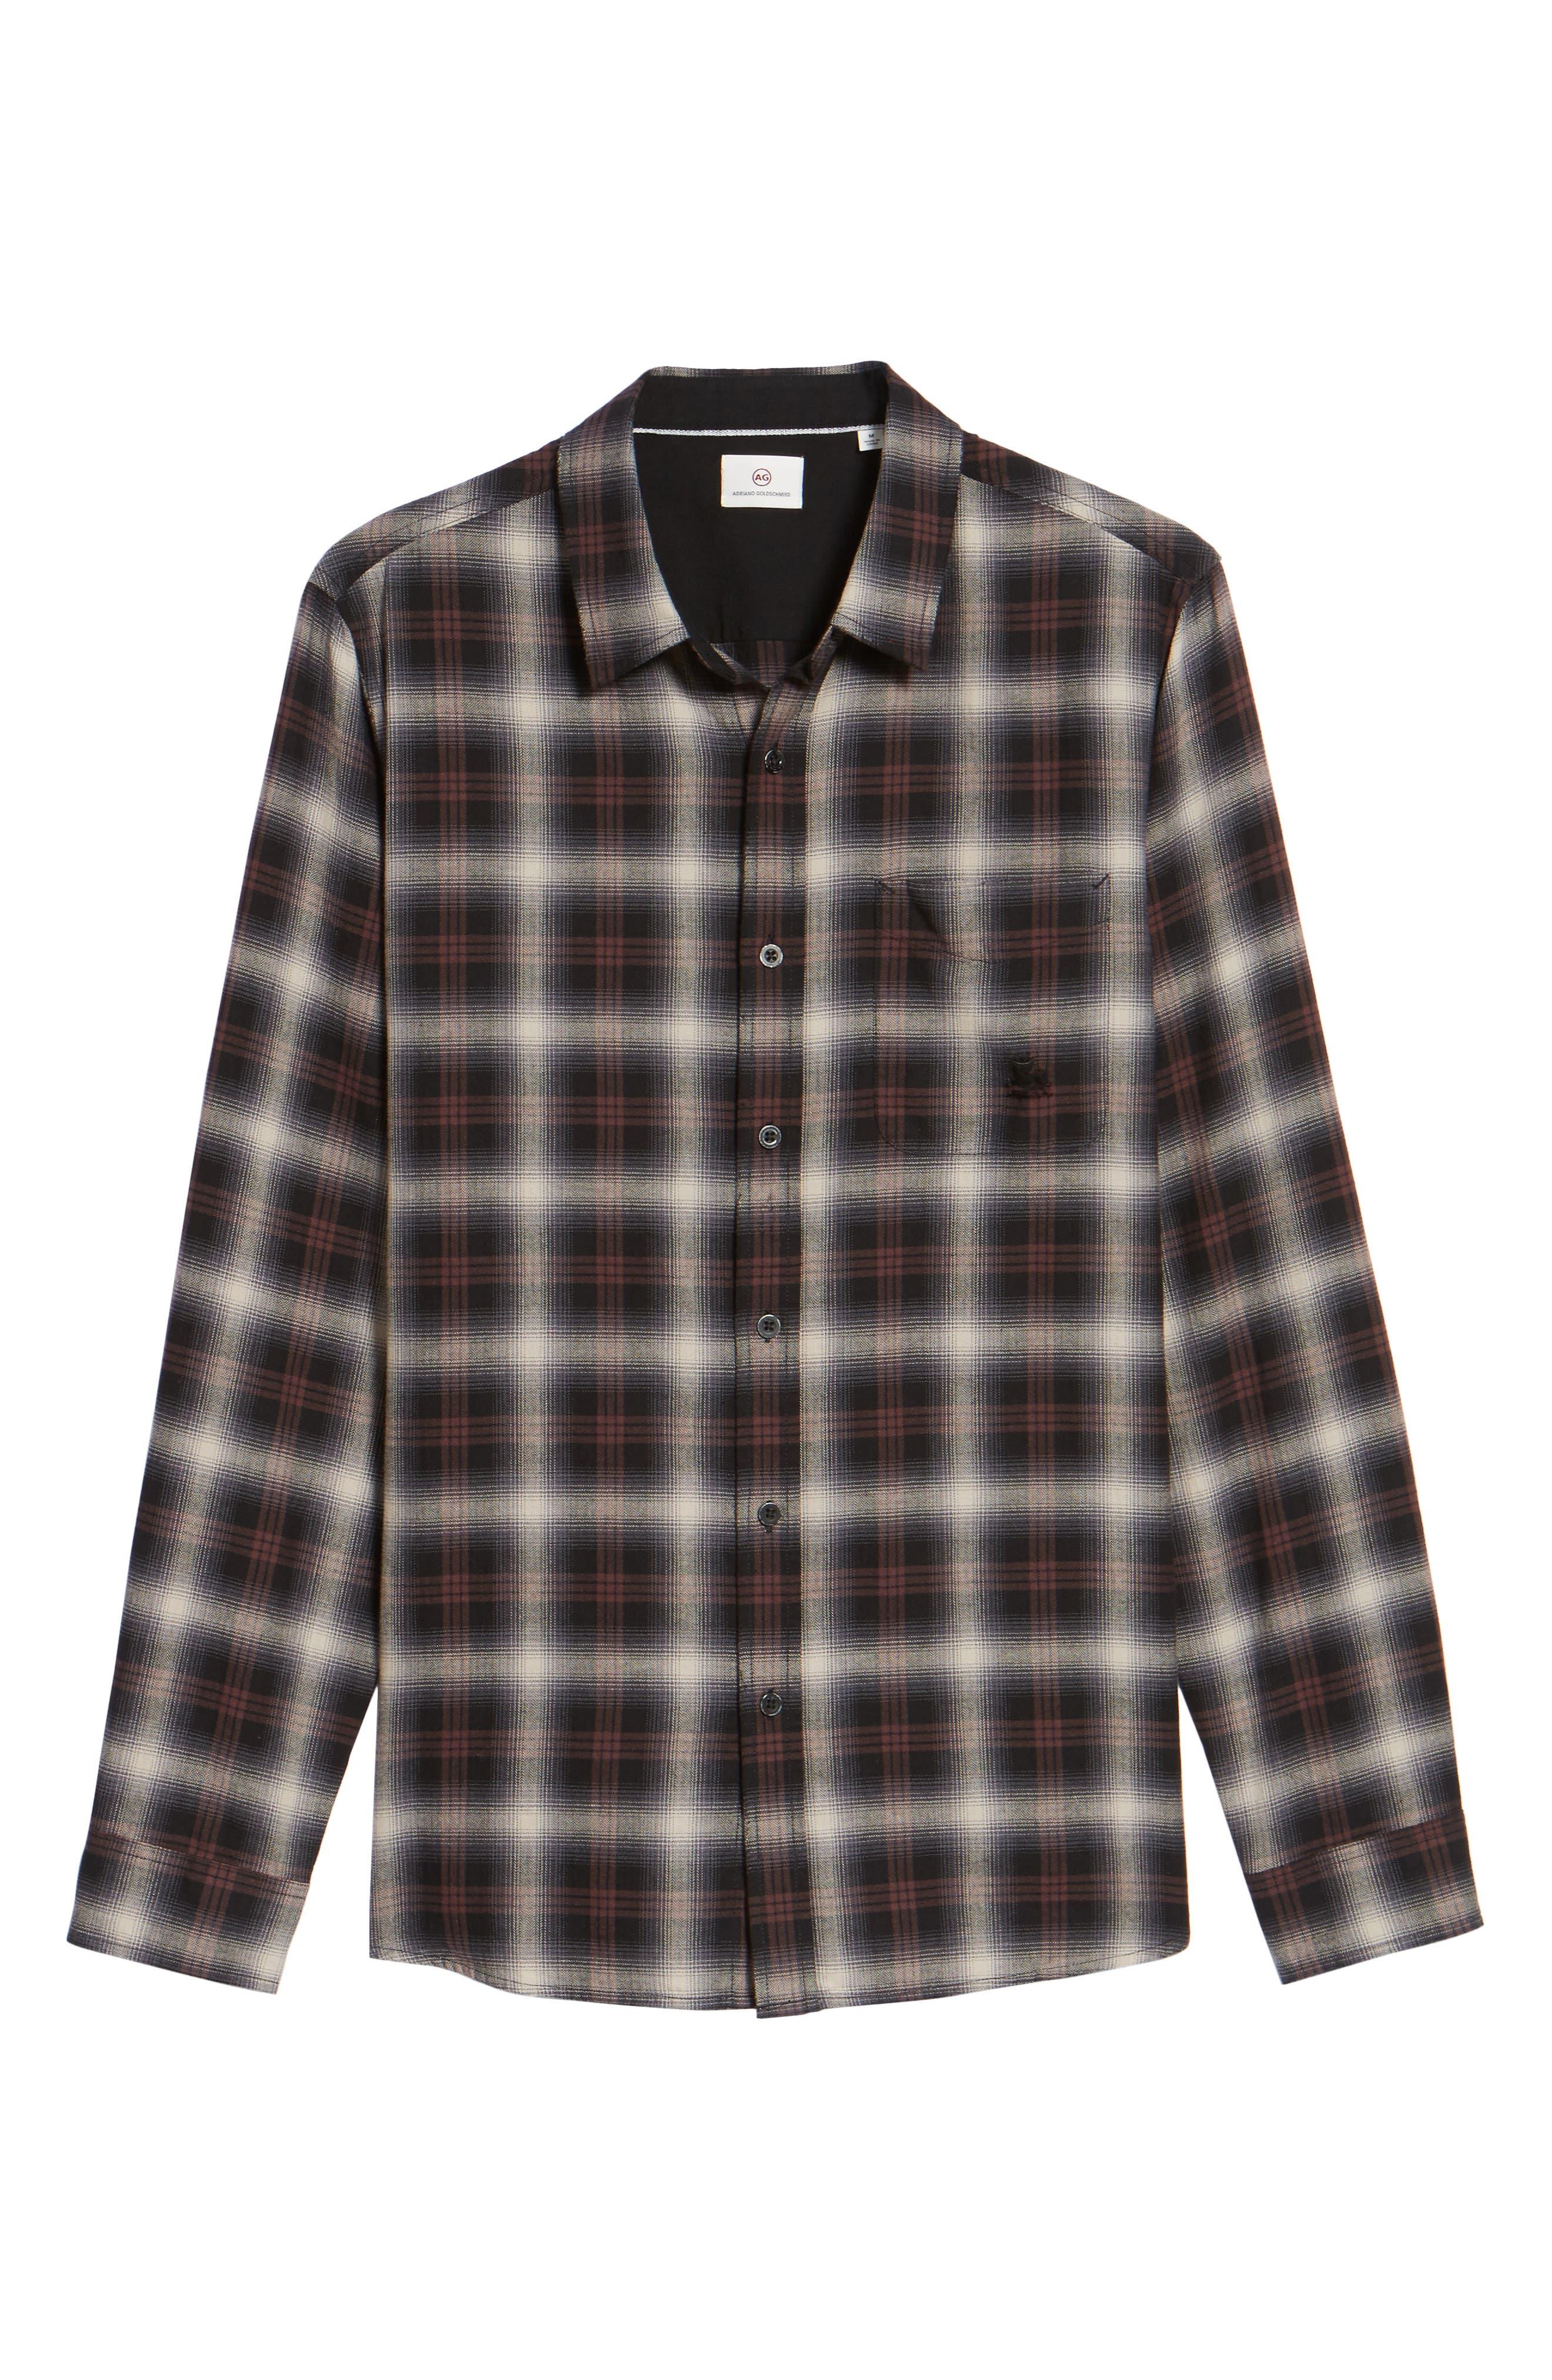 Colton Slim Fit Plaid Sport Shirt,                             Alternate thumbnail 6, color,                             7 Years Beige/ Deep Mahogany